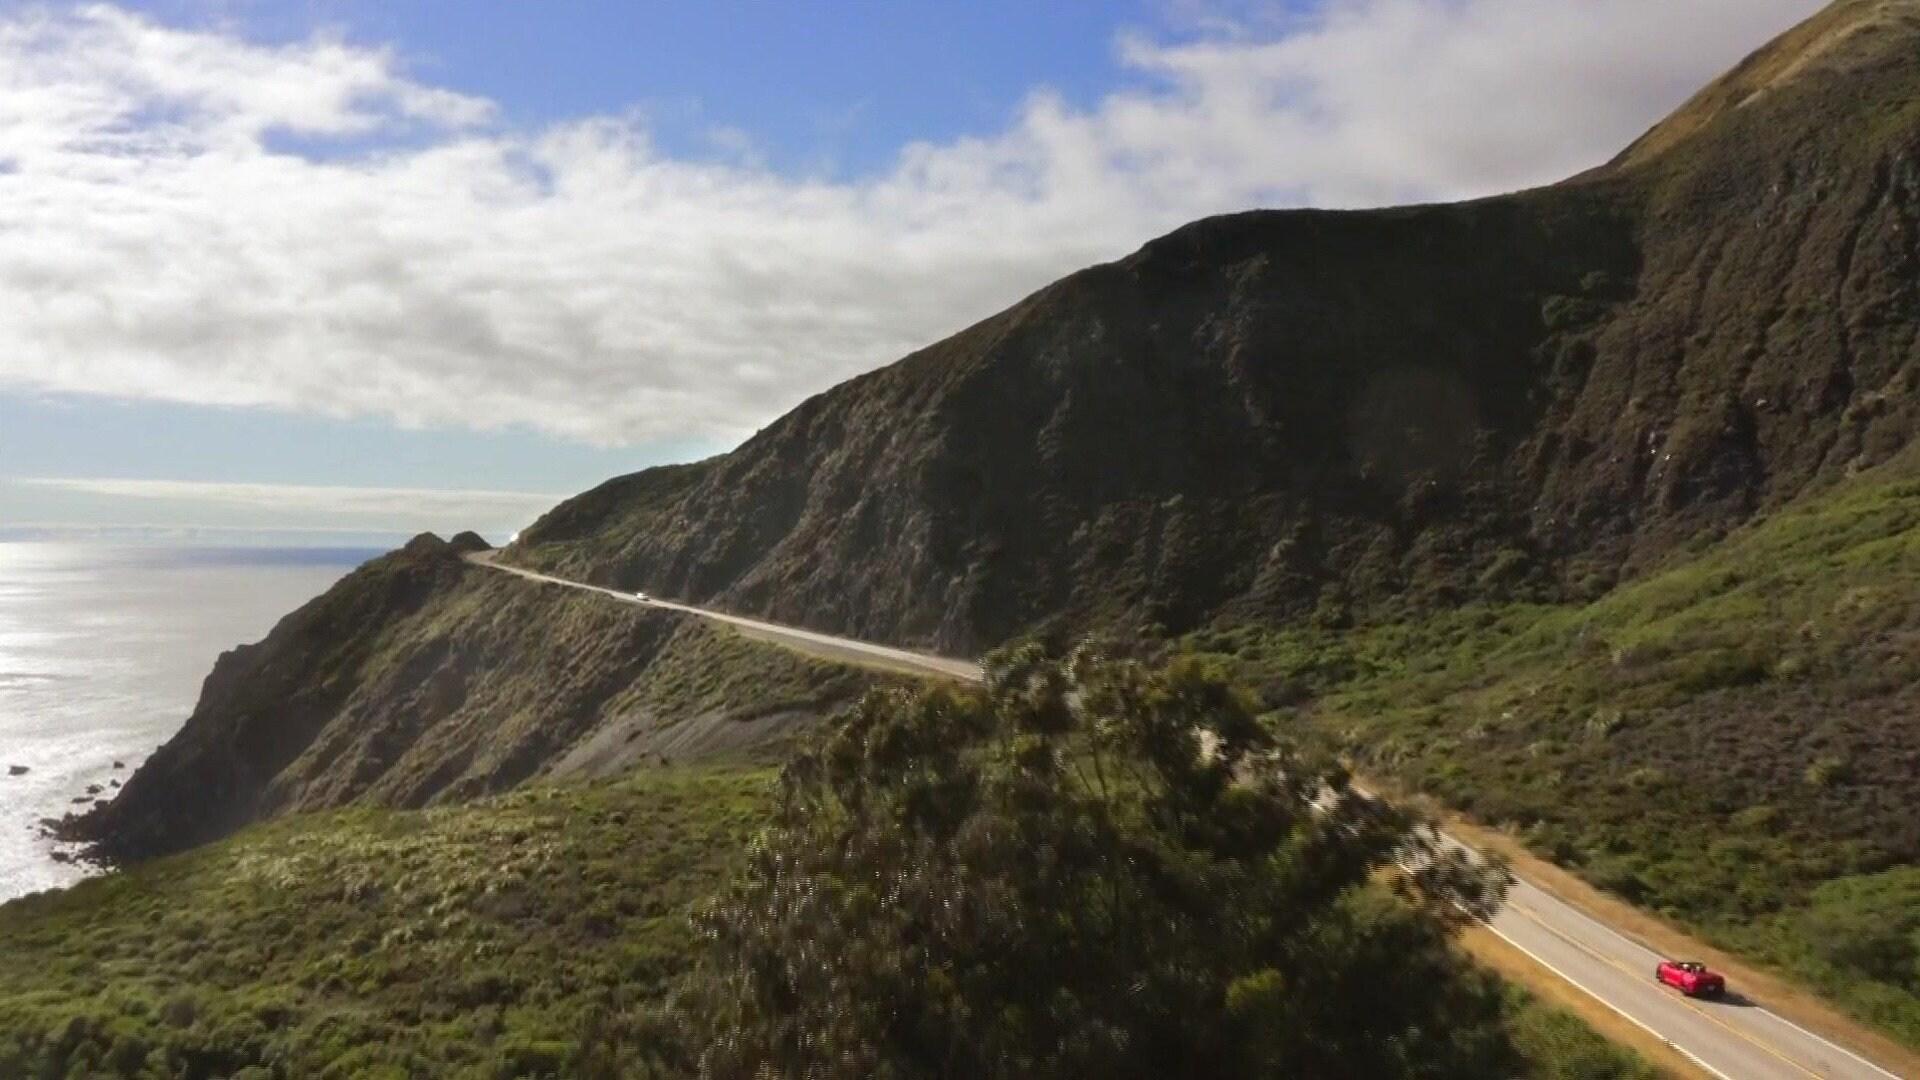 Destination Pacific Coast Highway